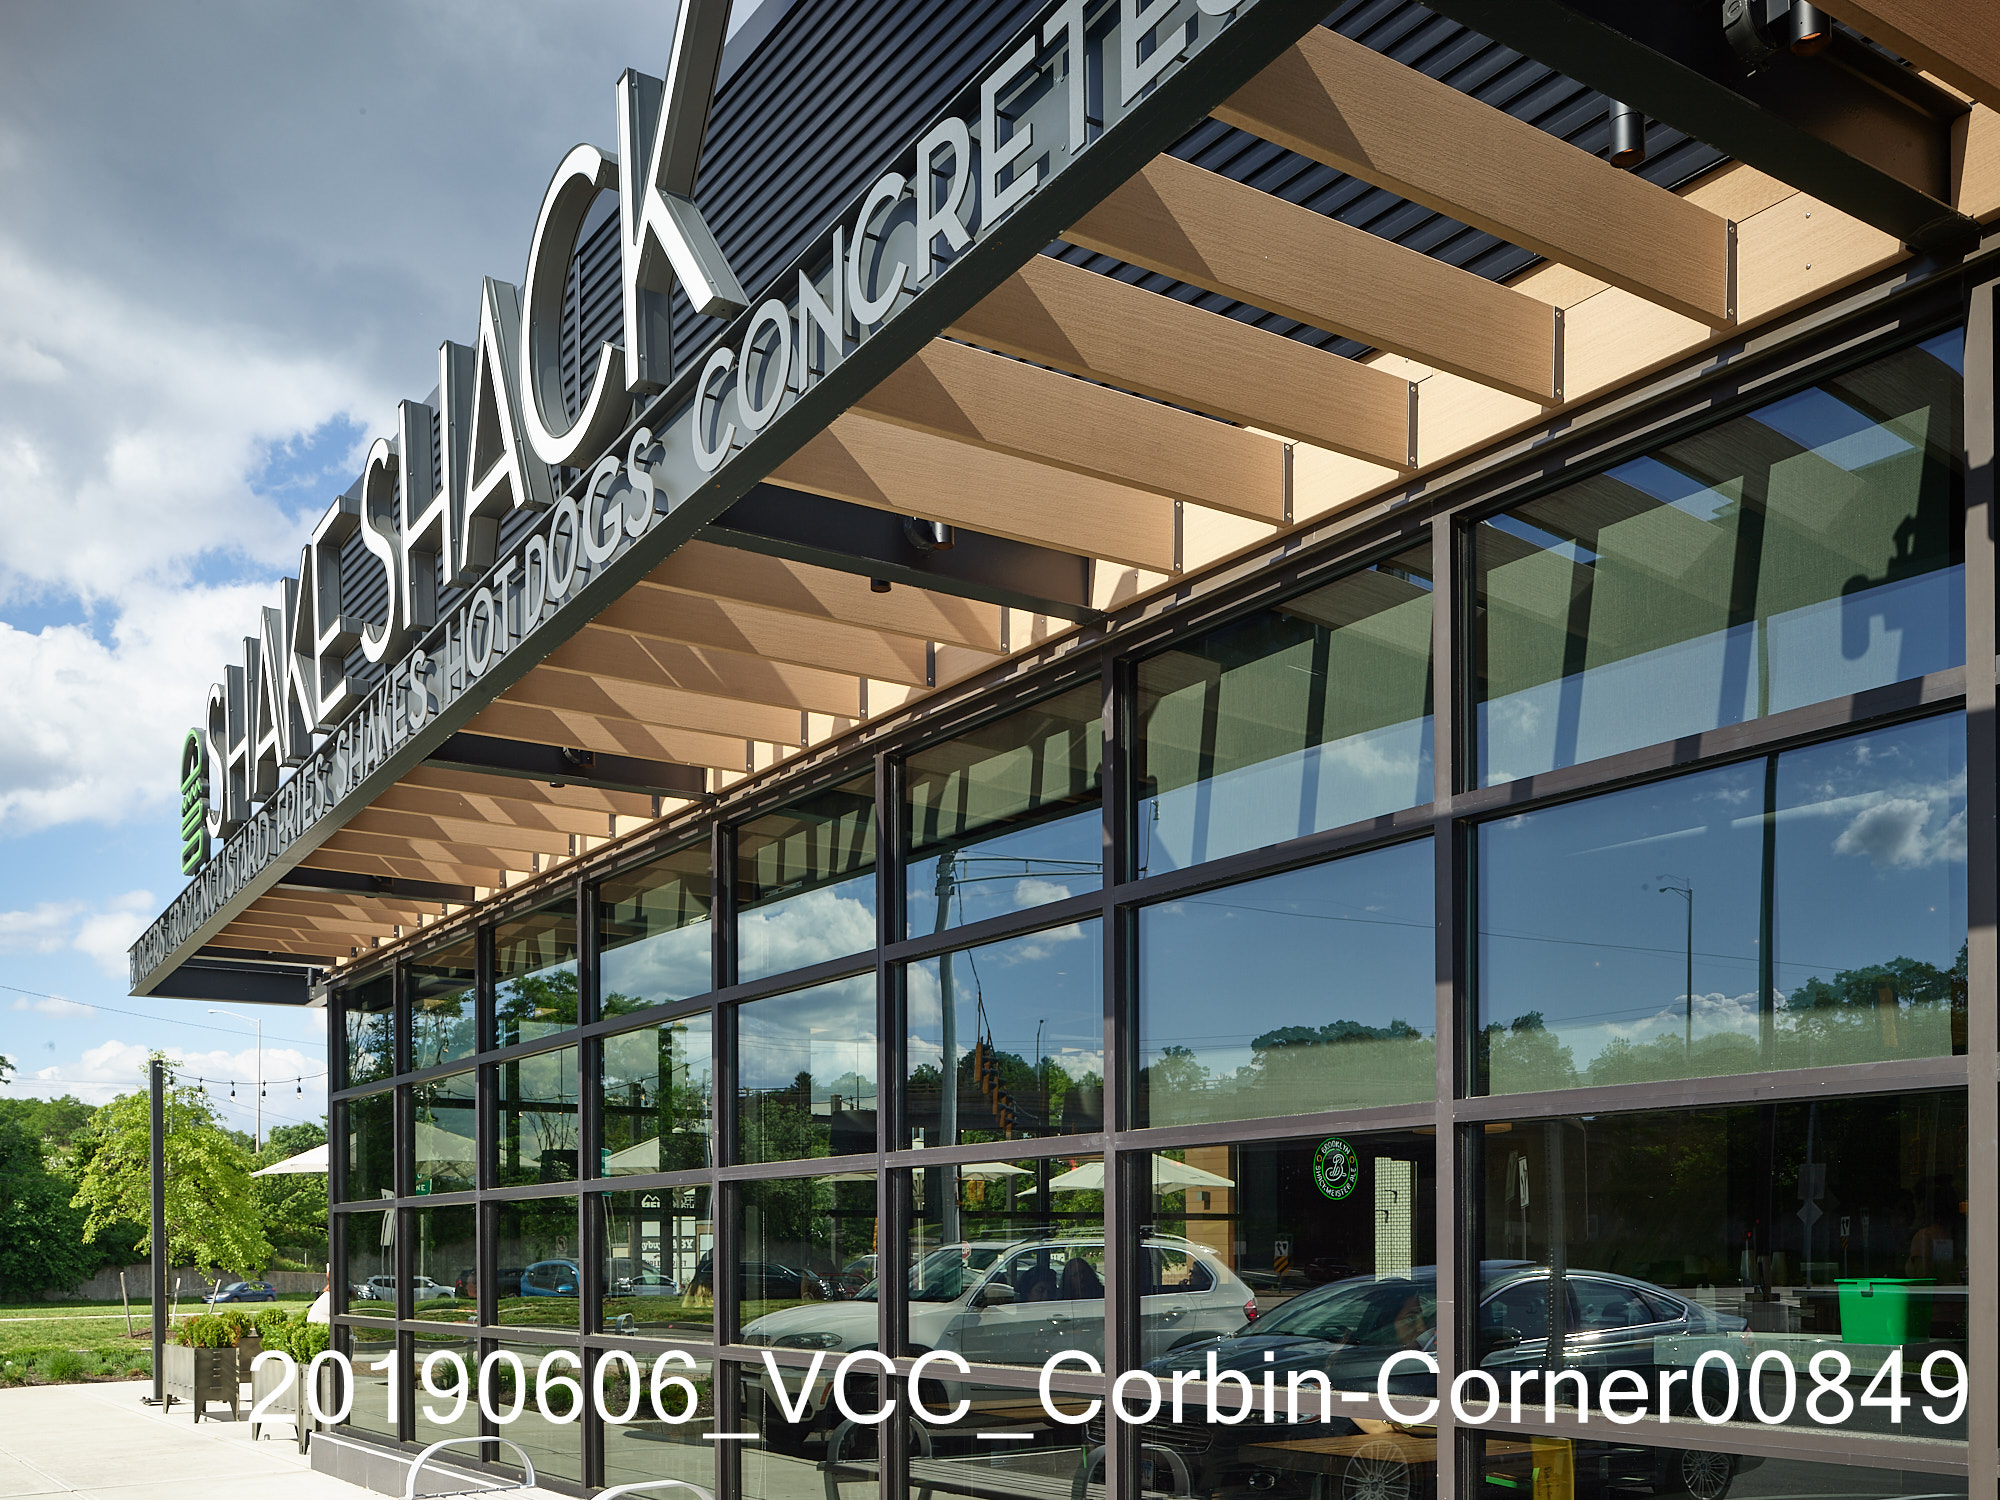 20190606_VCC_Corbin-Corner00849.jpg